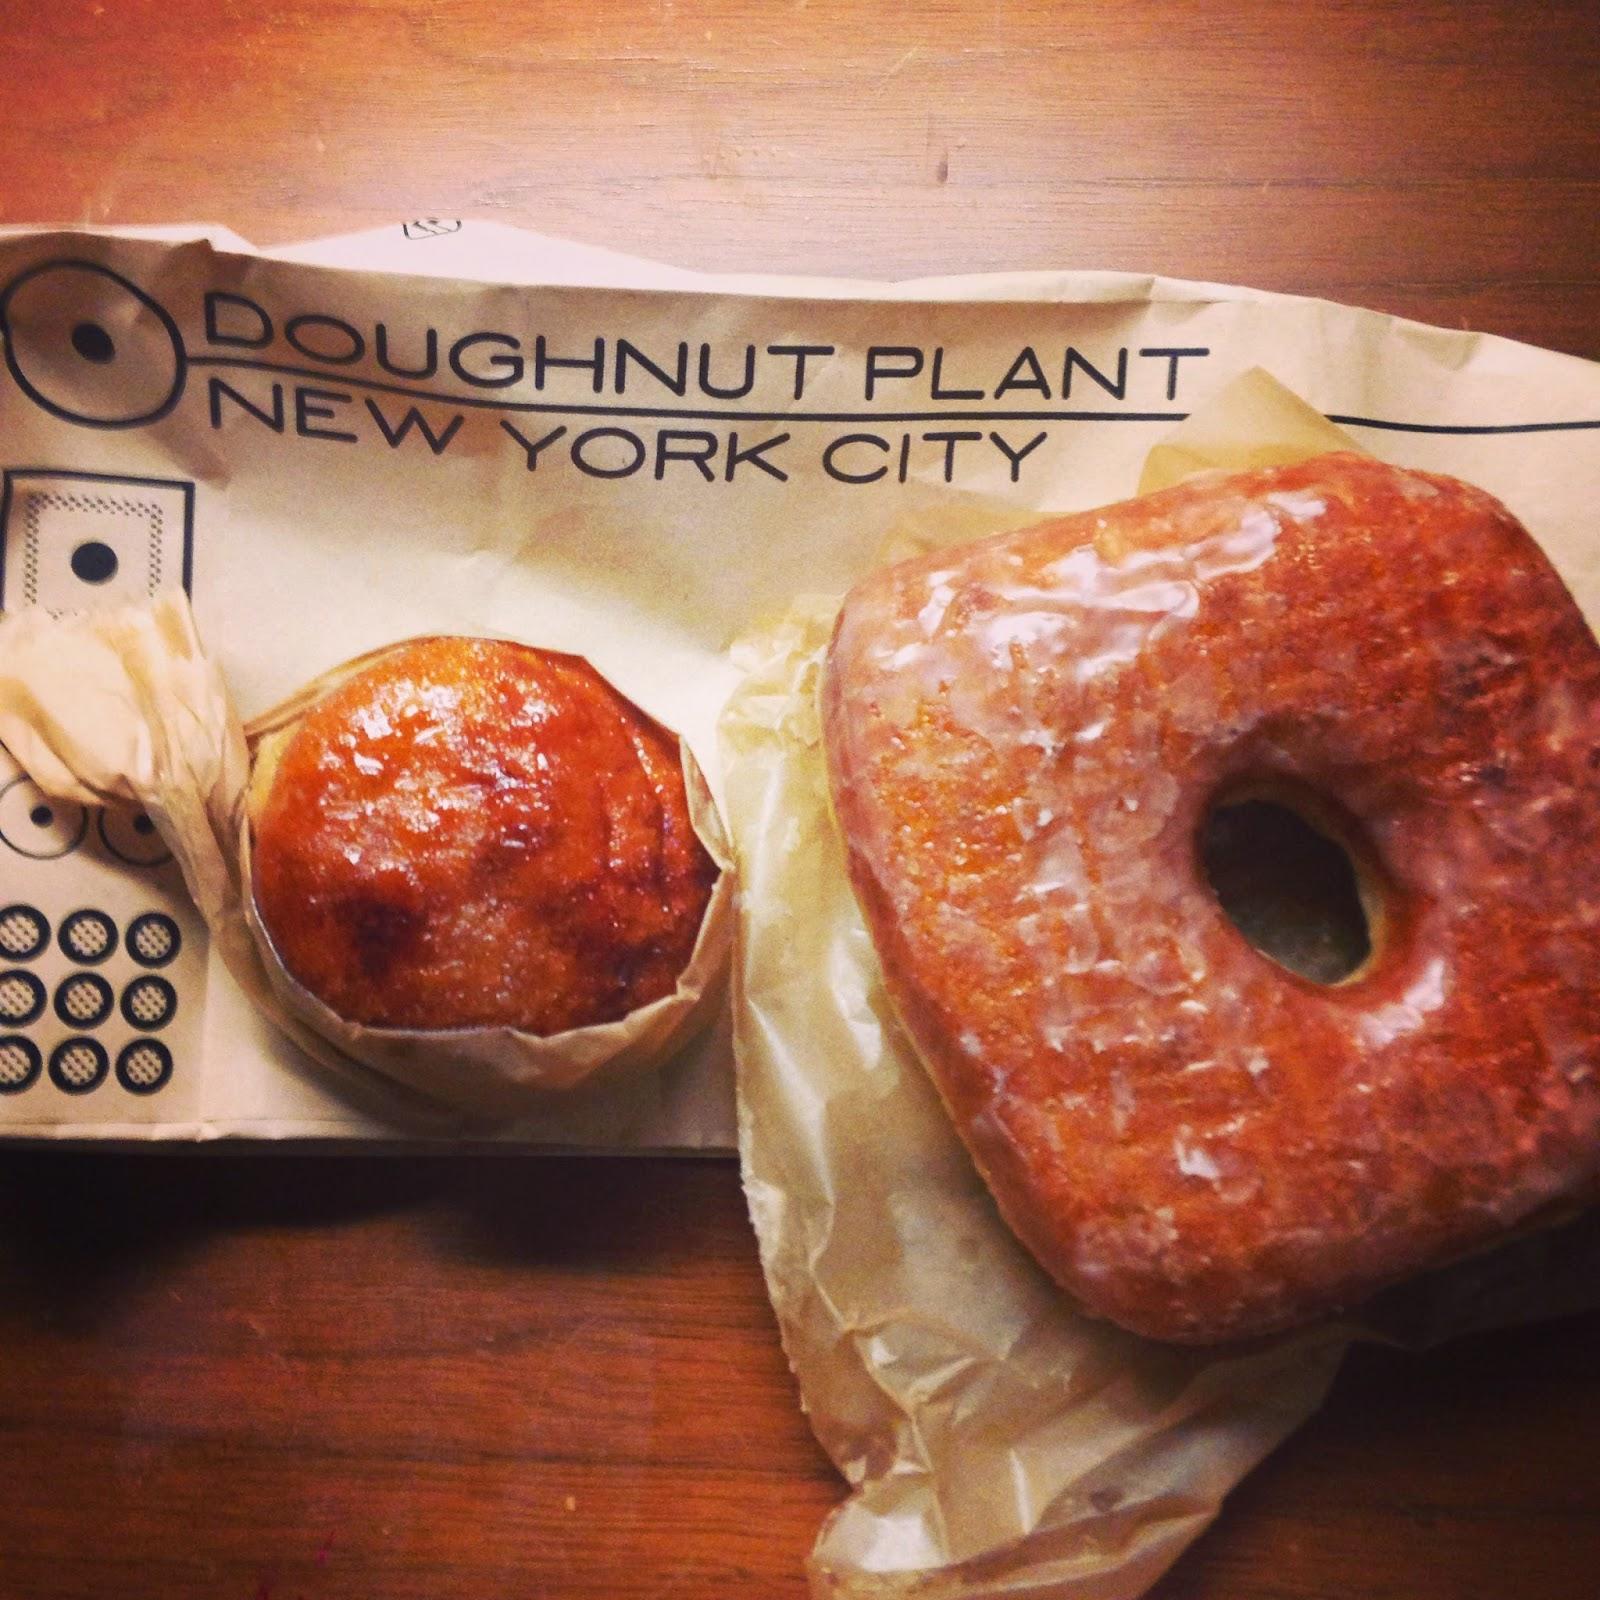 Doughnut Plant: Dishing Up Delights